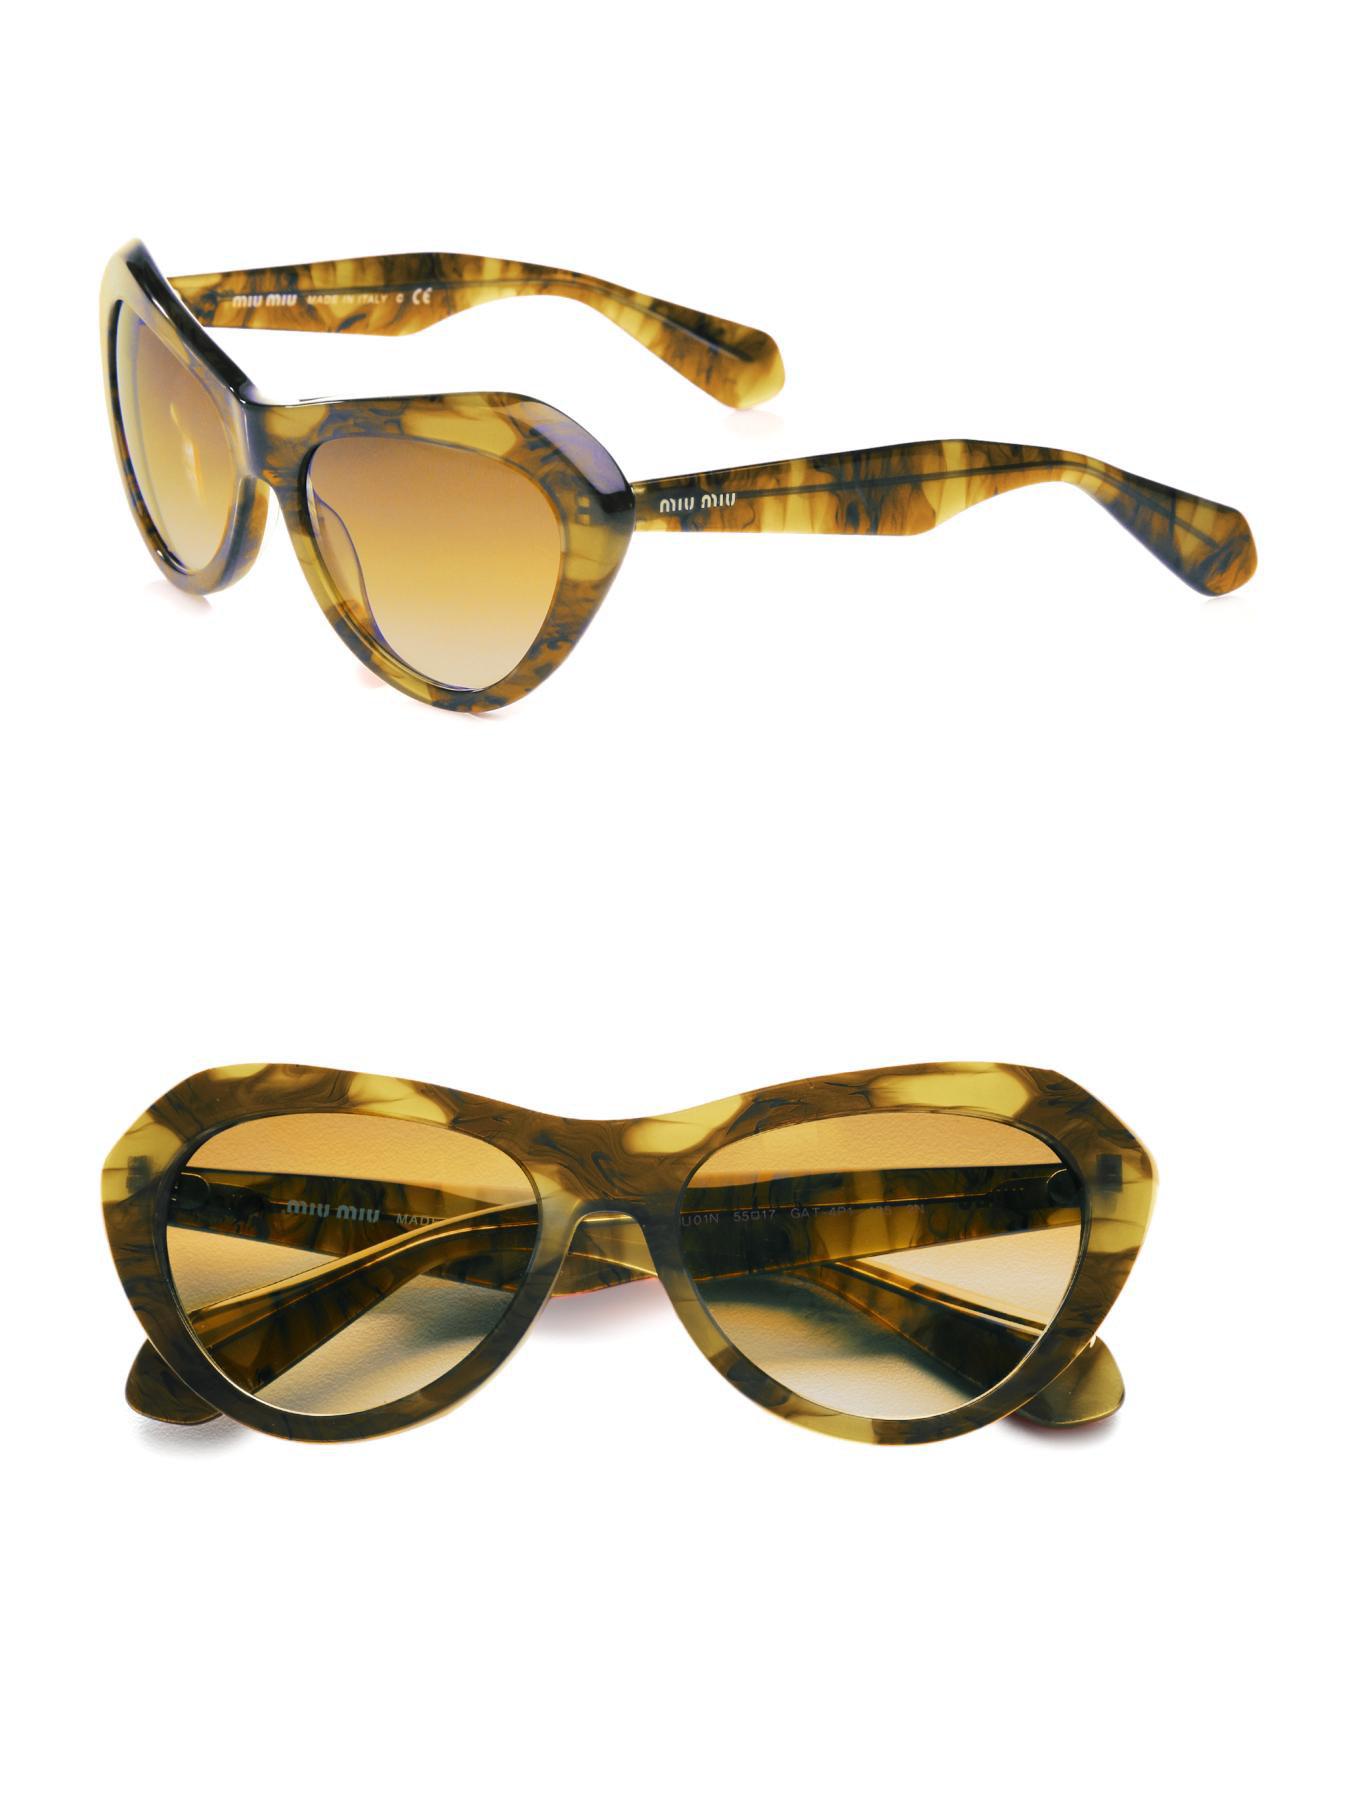 024e7fcf398 Miu Miu Cat Eye Sunglasses Tortoise « Heritage Malta